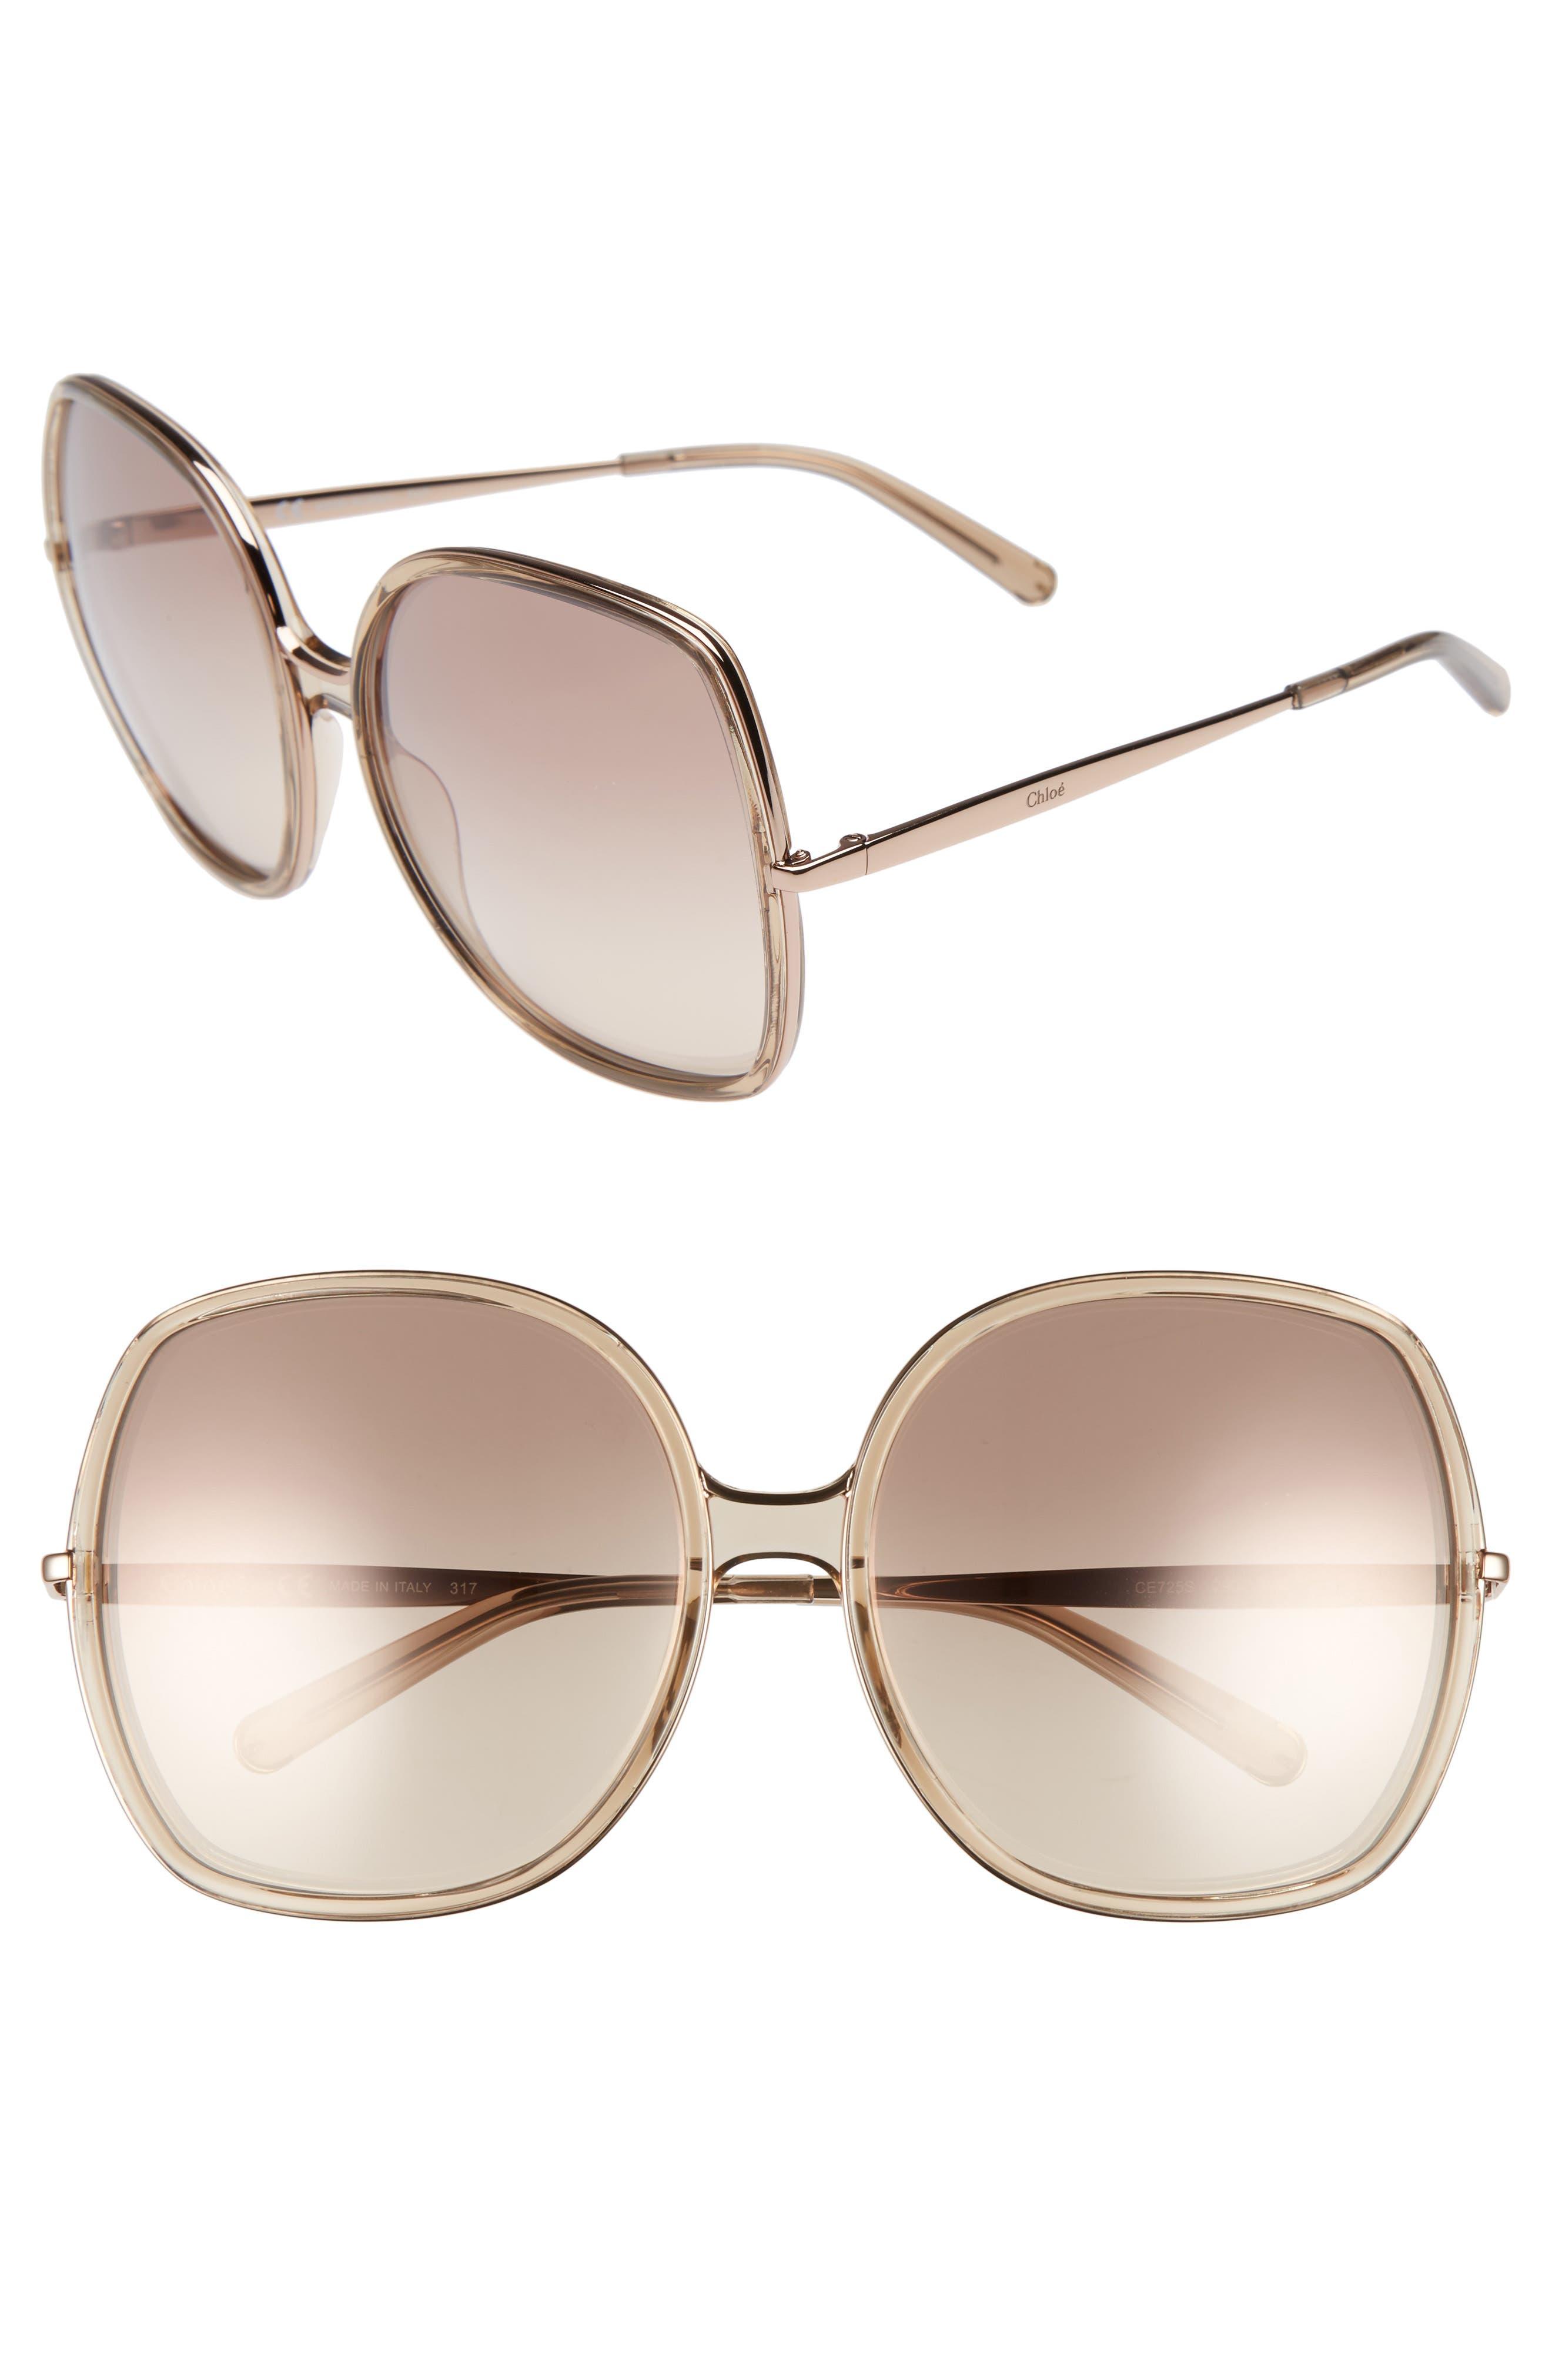 Sunglasses On Sale, Blue, 2017, one size Chloé